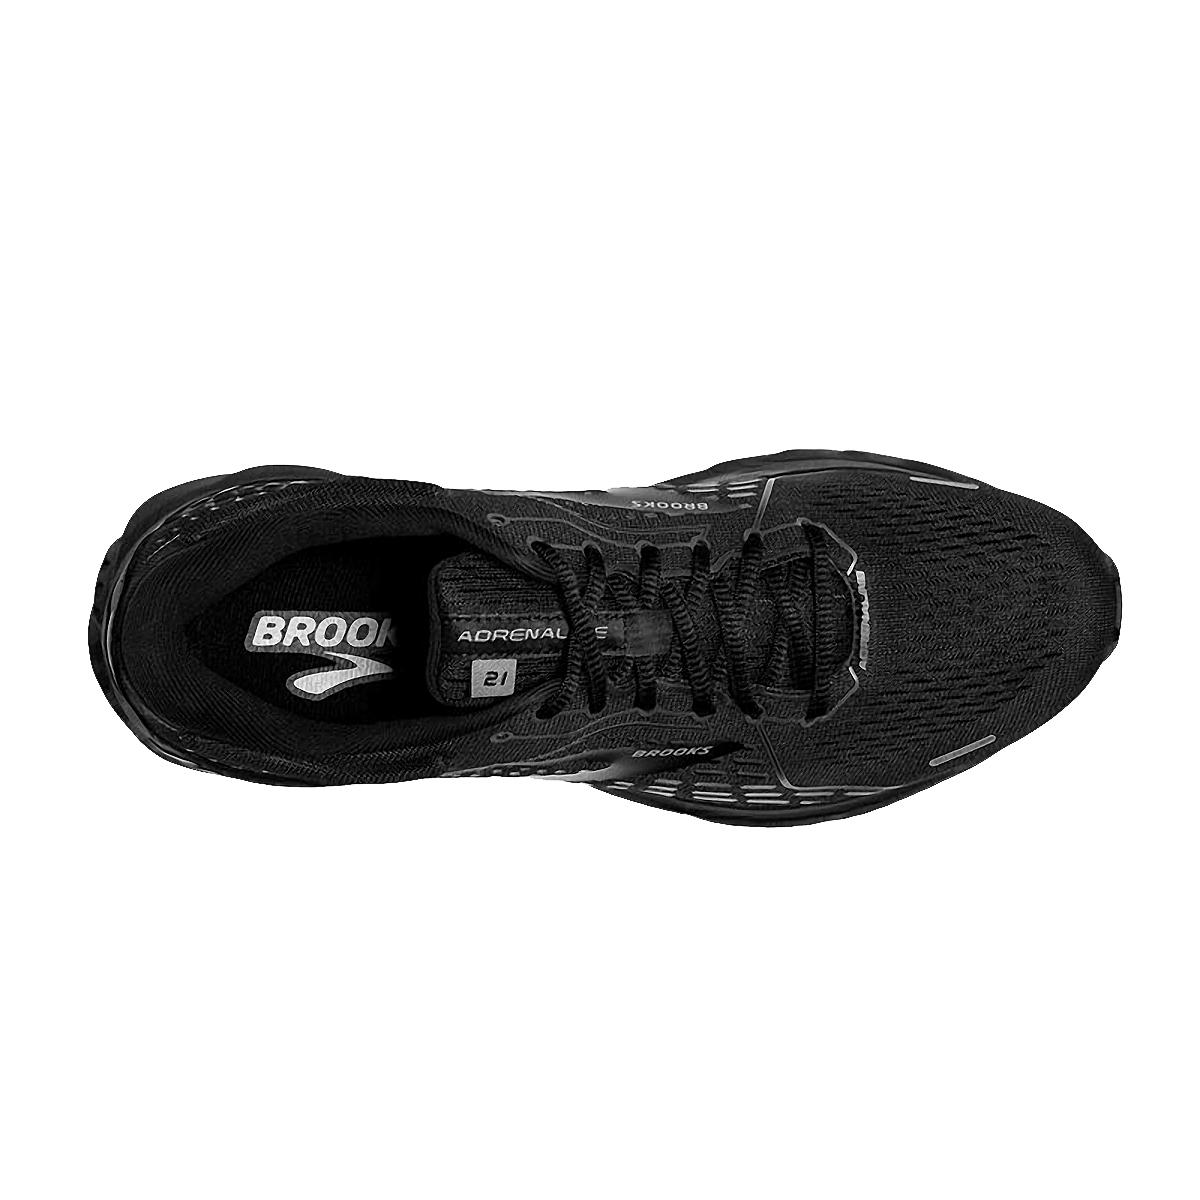 Men's Brooks Adrenaline GTS 21 Running Shoe - Color: Black/Black/Ebony - Size: 7 - Width: Regular, Black/Black/Ebony, large, image 3